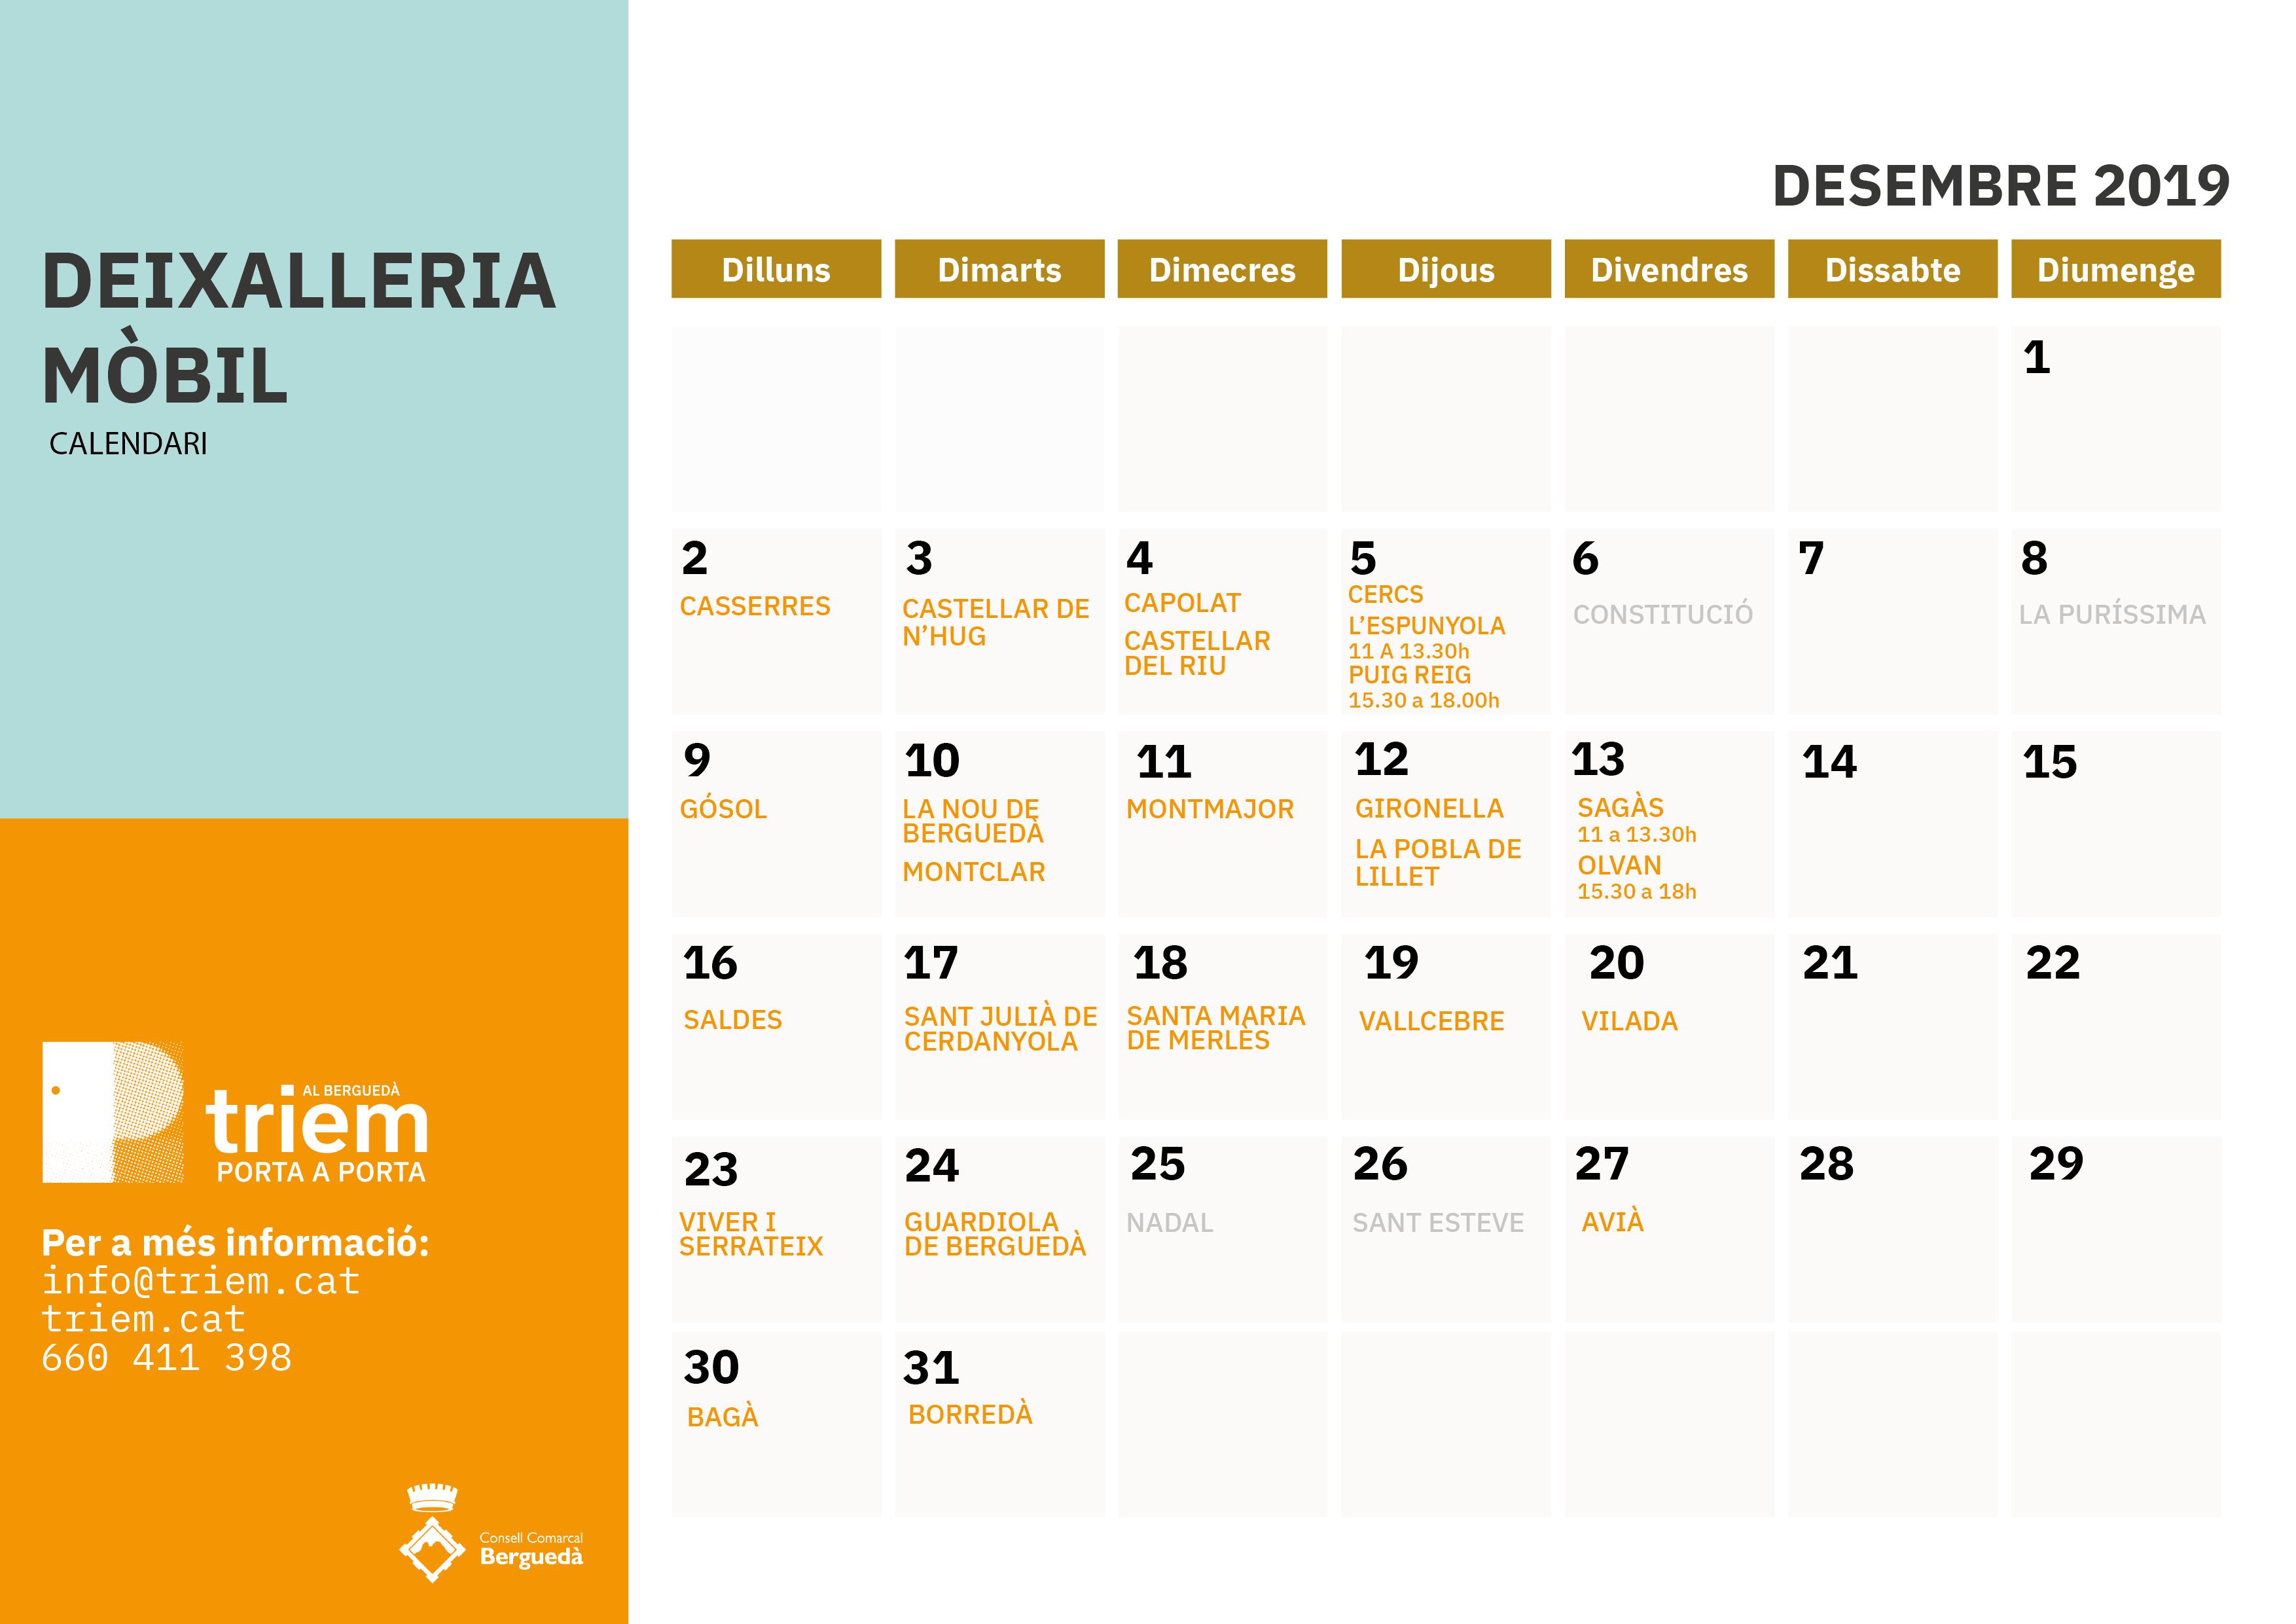 DEIXALLERIA MÒBIL DESEMBRE 2019